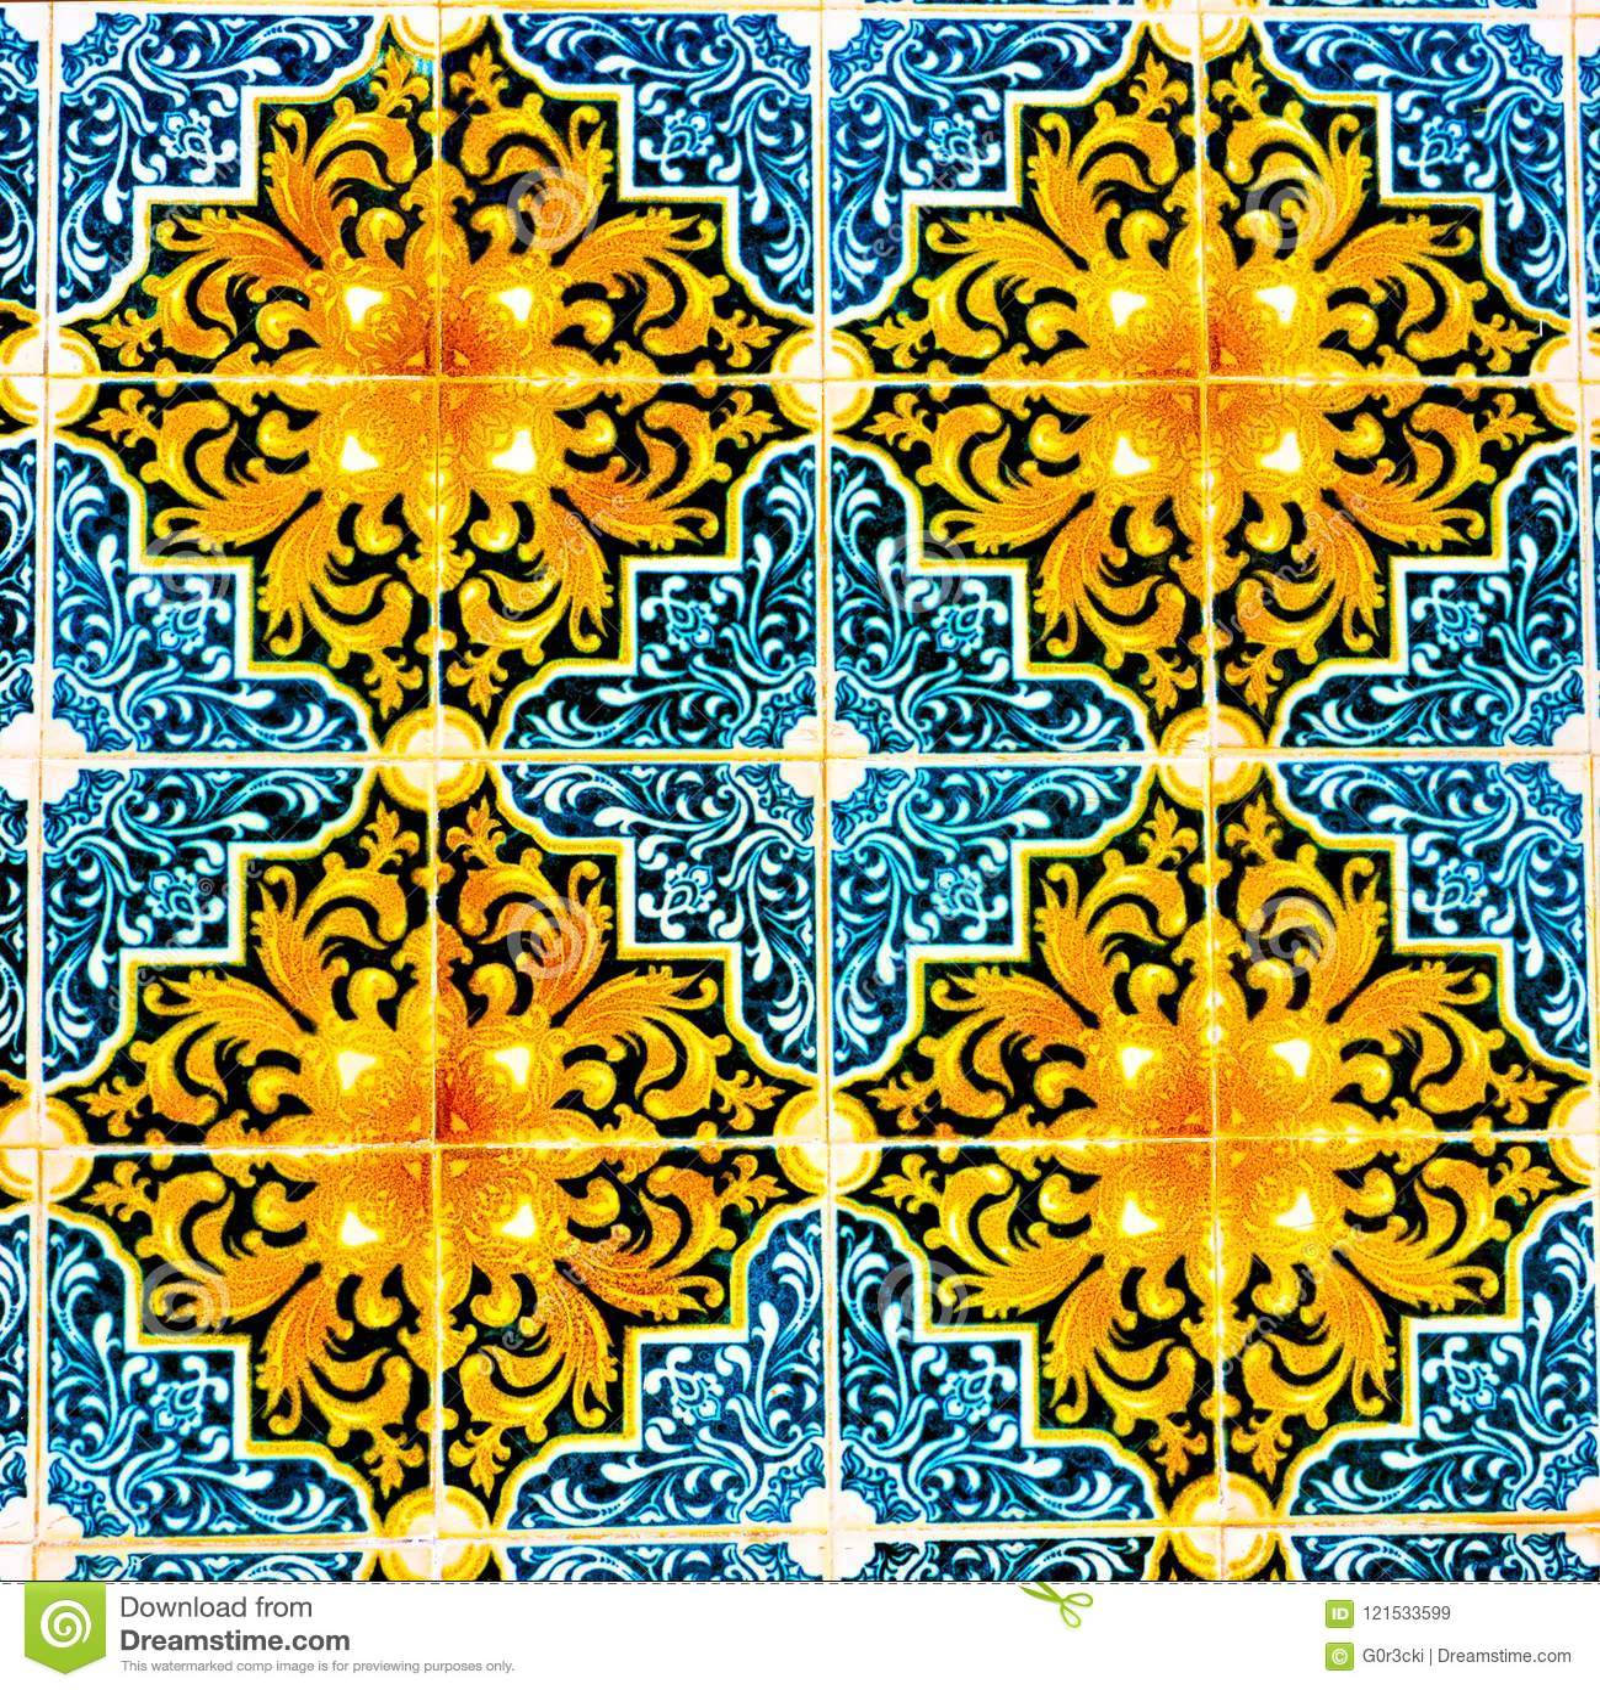 Portuguese Pattern Tiles, Handmade Glazed Colorful Tile, Backgrounds, Portugal Colorful Street Art, Travel Europe